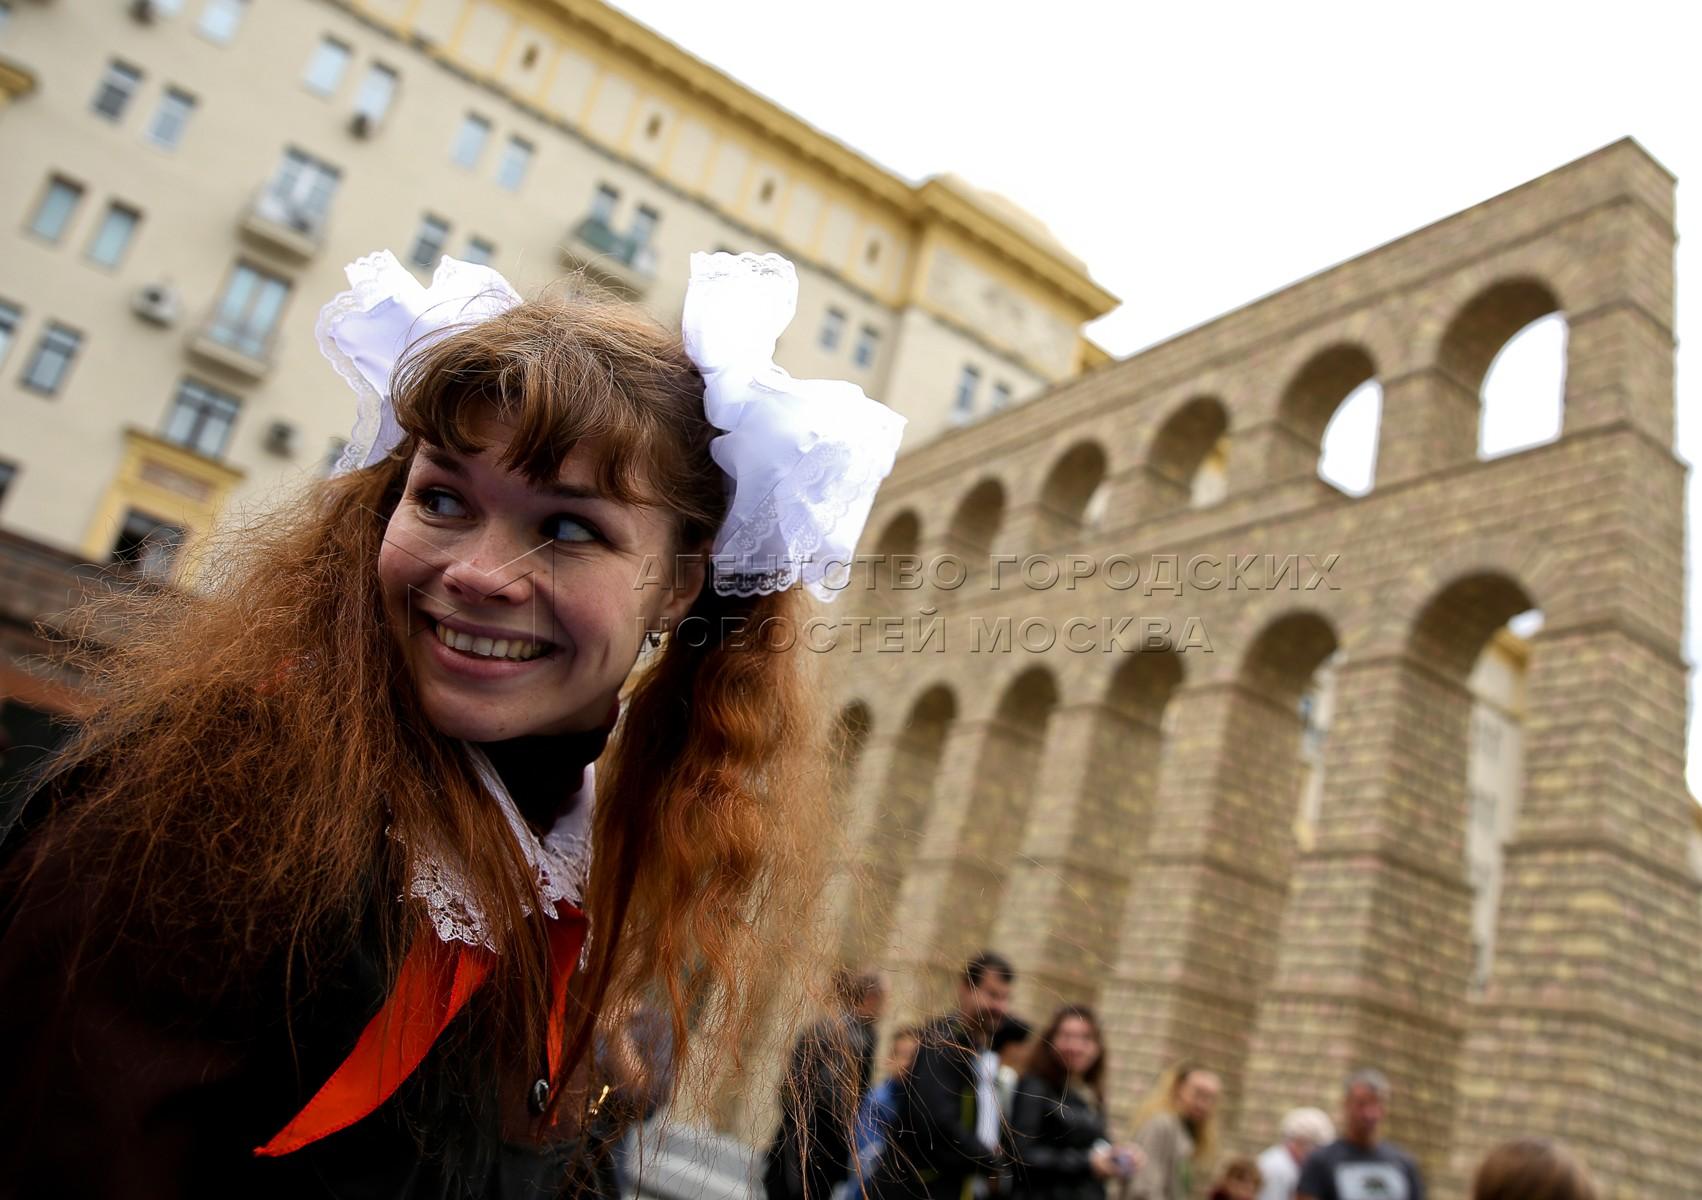 Празднование Дня города на Манежной площади Фото: Зыков Кирилл